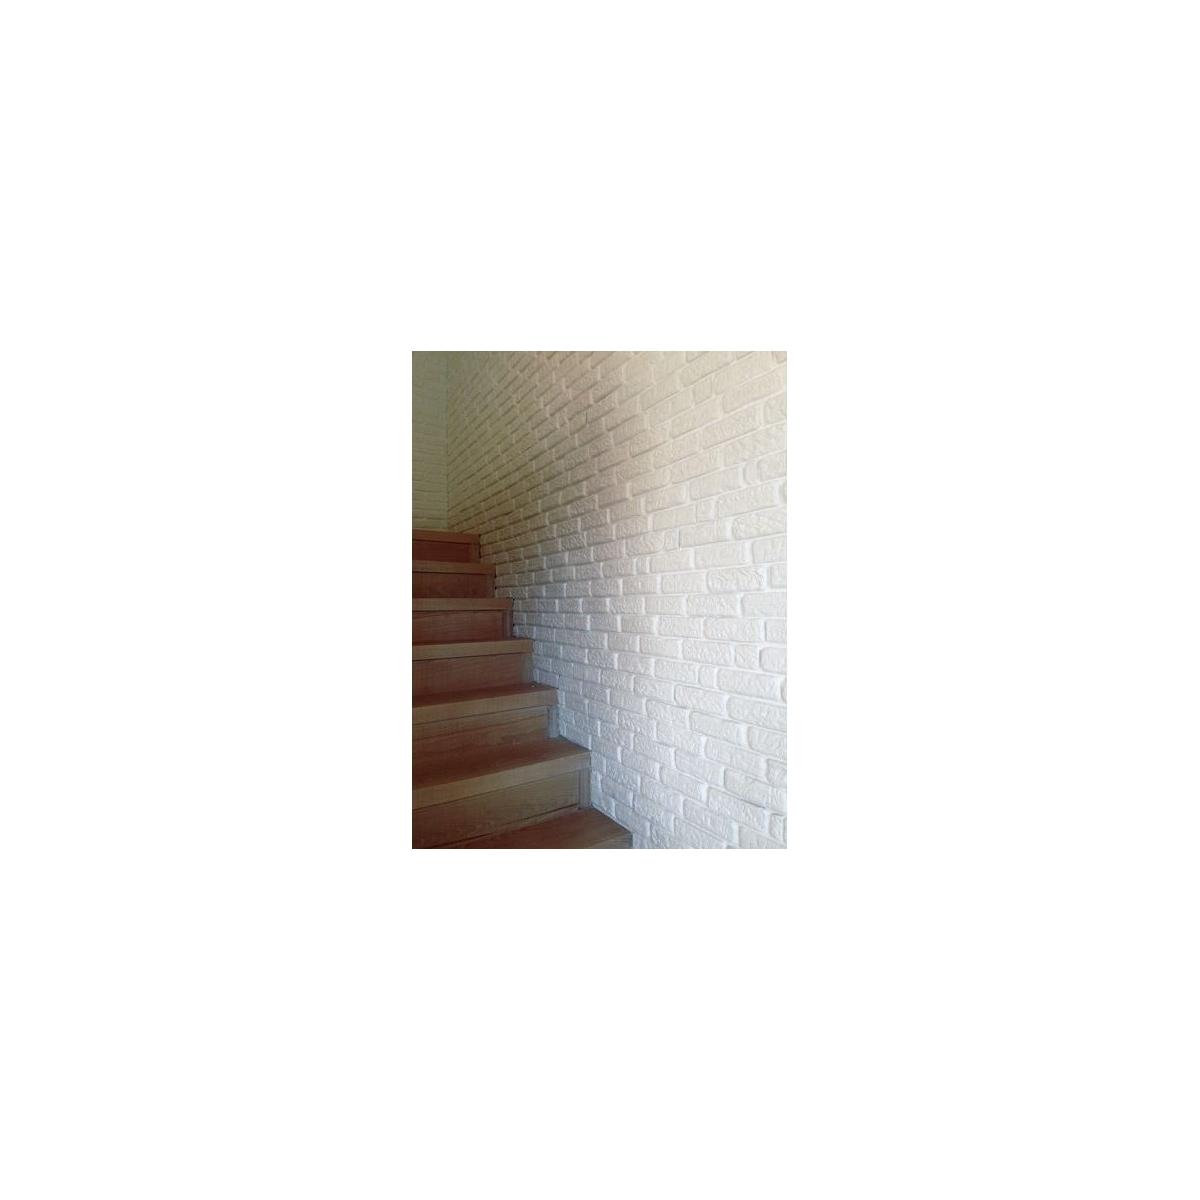 Plaqueta ángulo R81 Vitoria - Revestimiento con Plaquetas de yeso - Marca Revesti-Mur